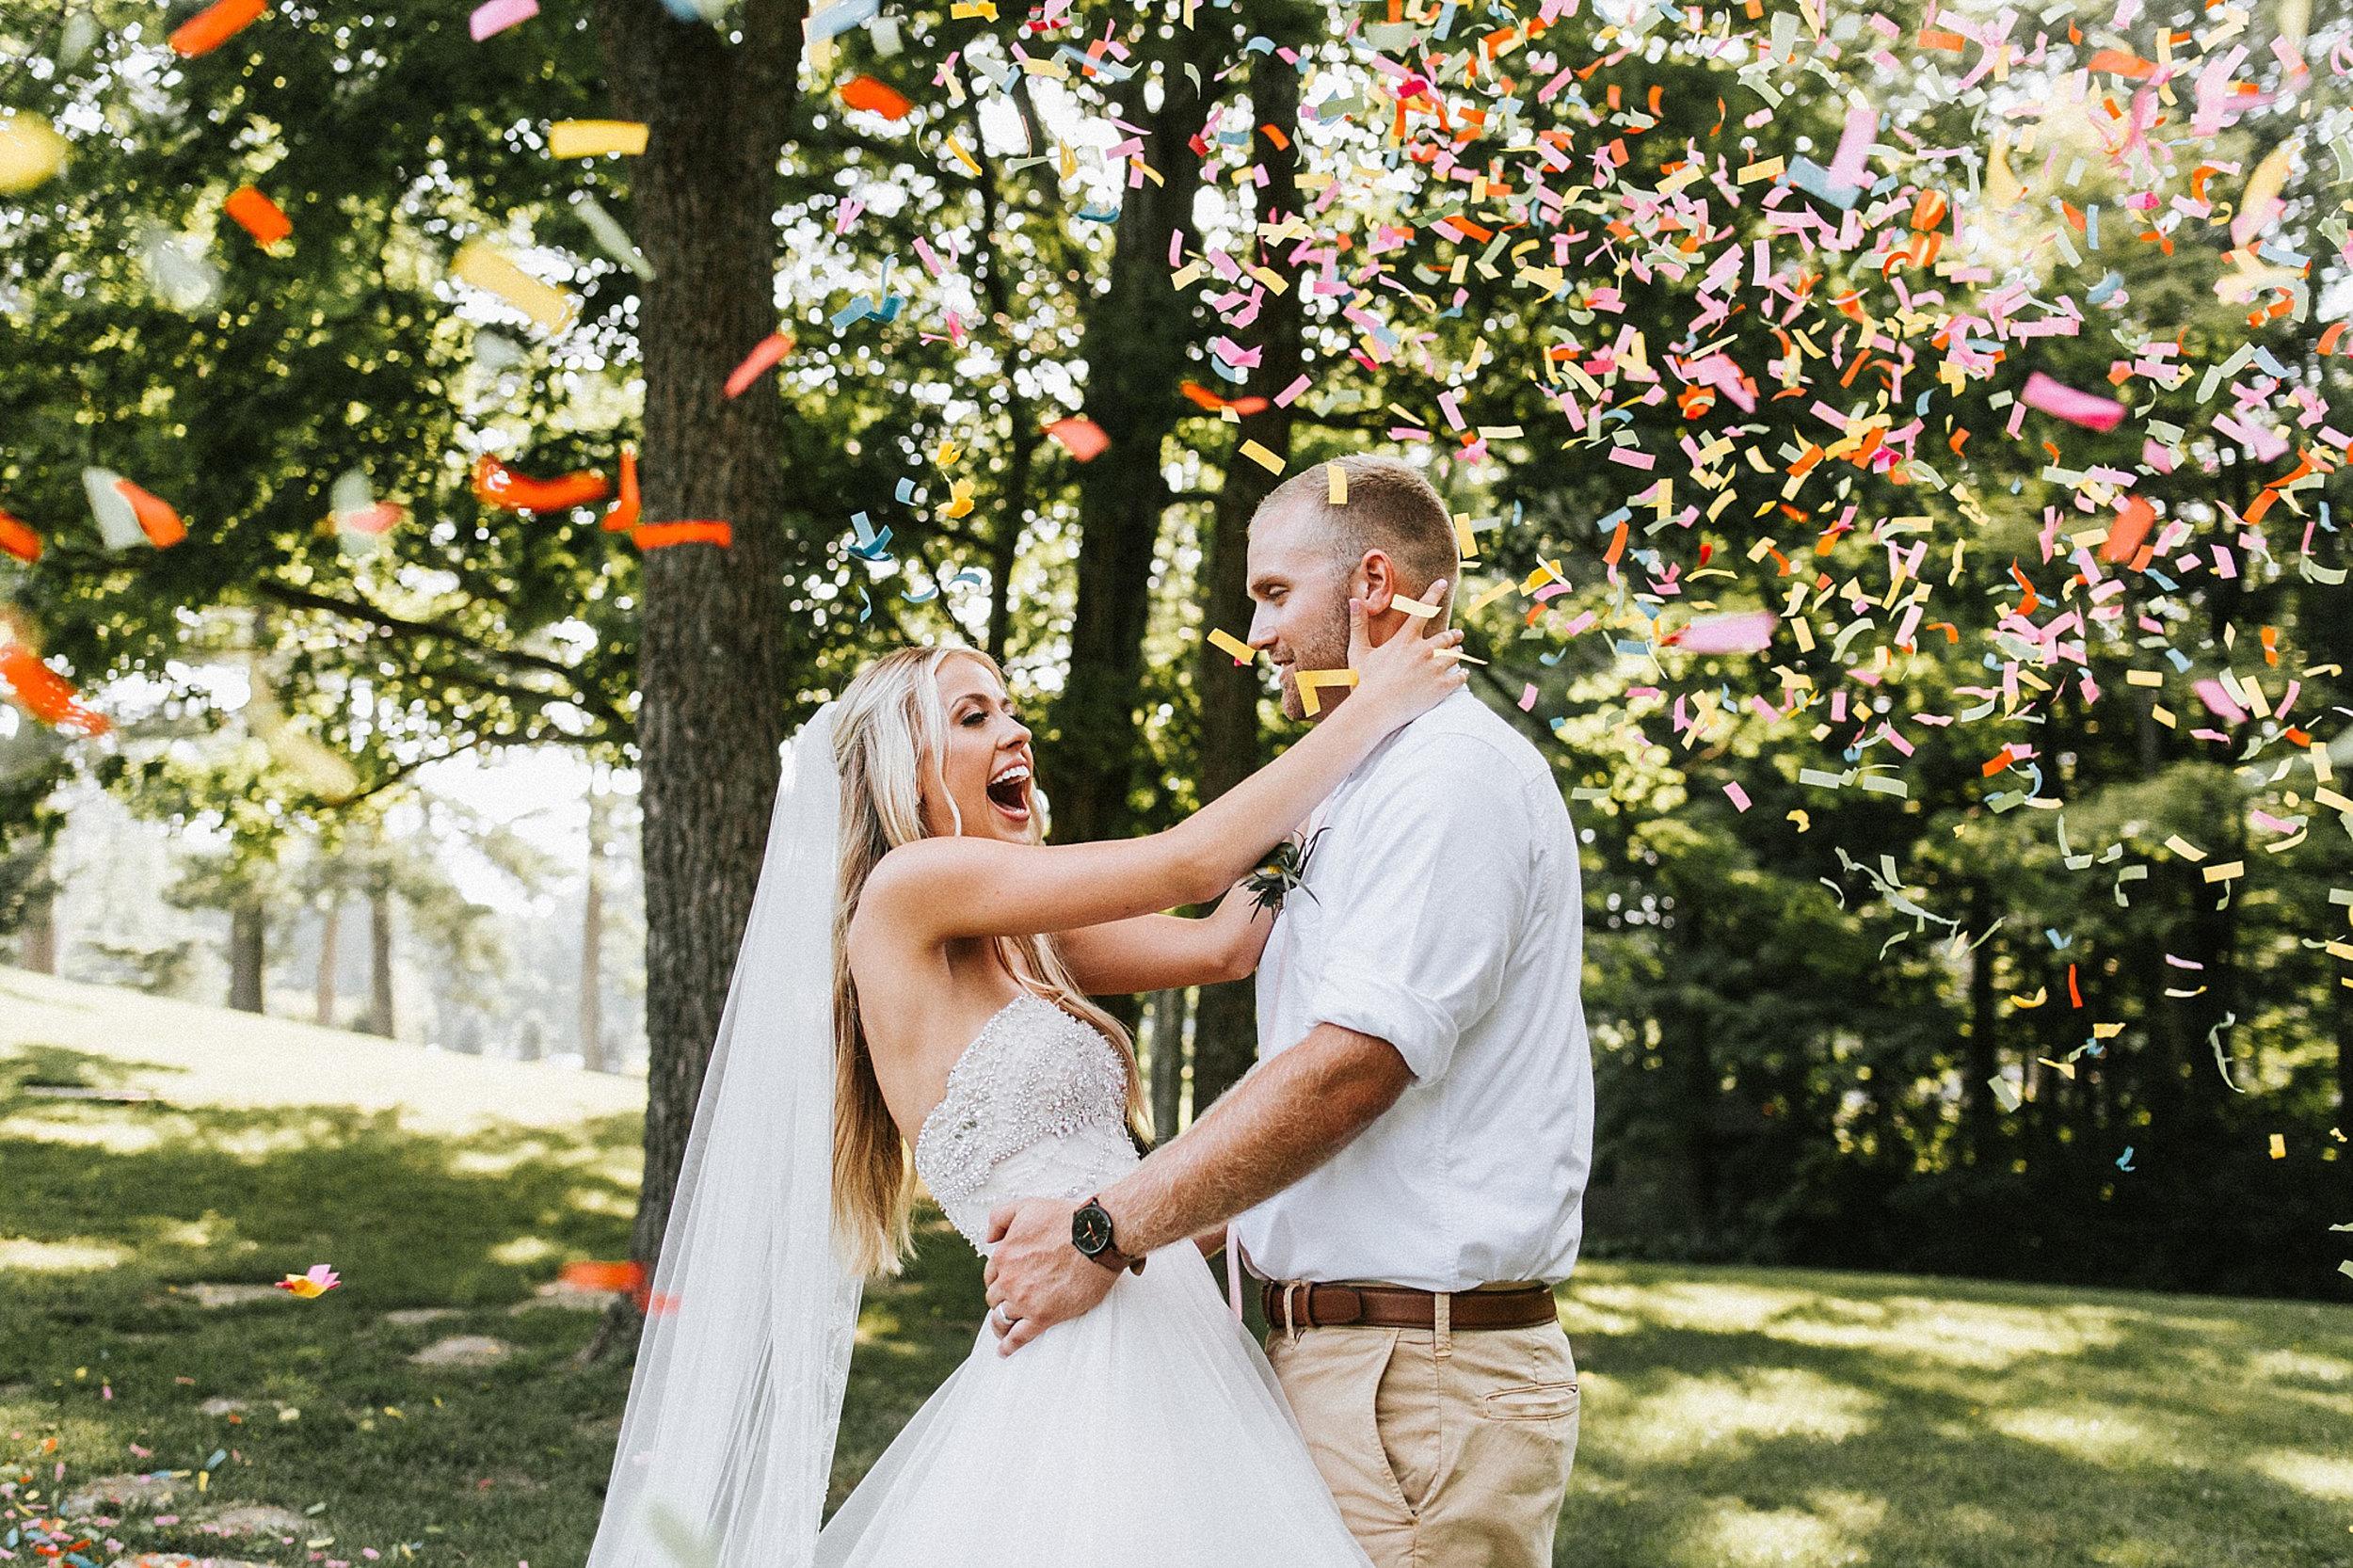 Brooke Townsend Photography - Cincinnati Wedding Photographer (96 of 153).jpg